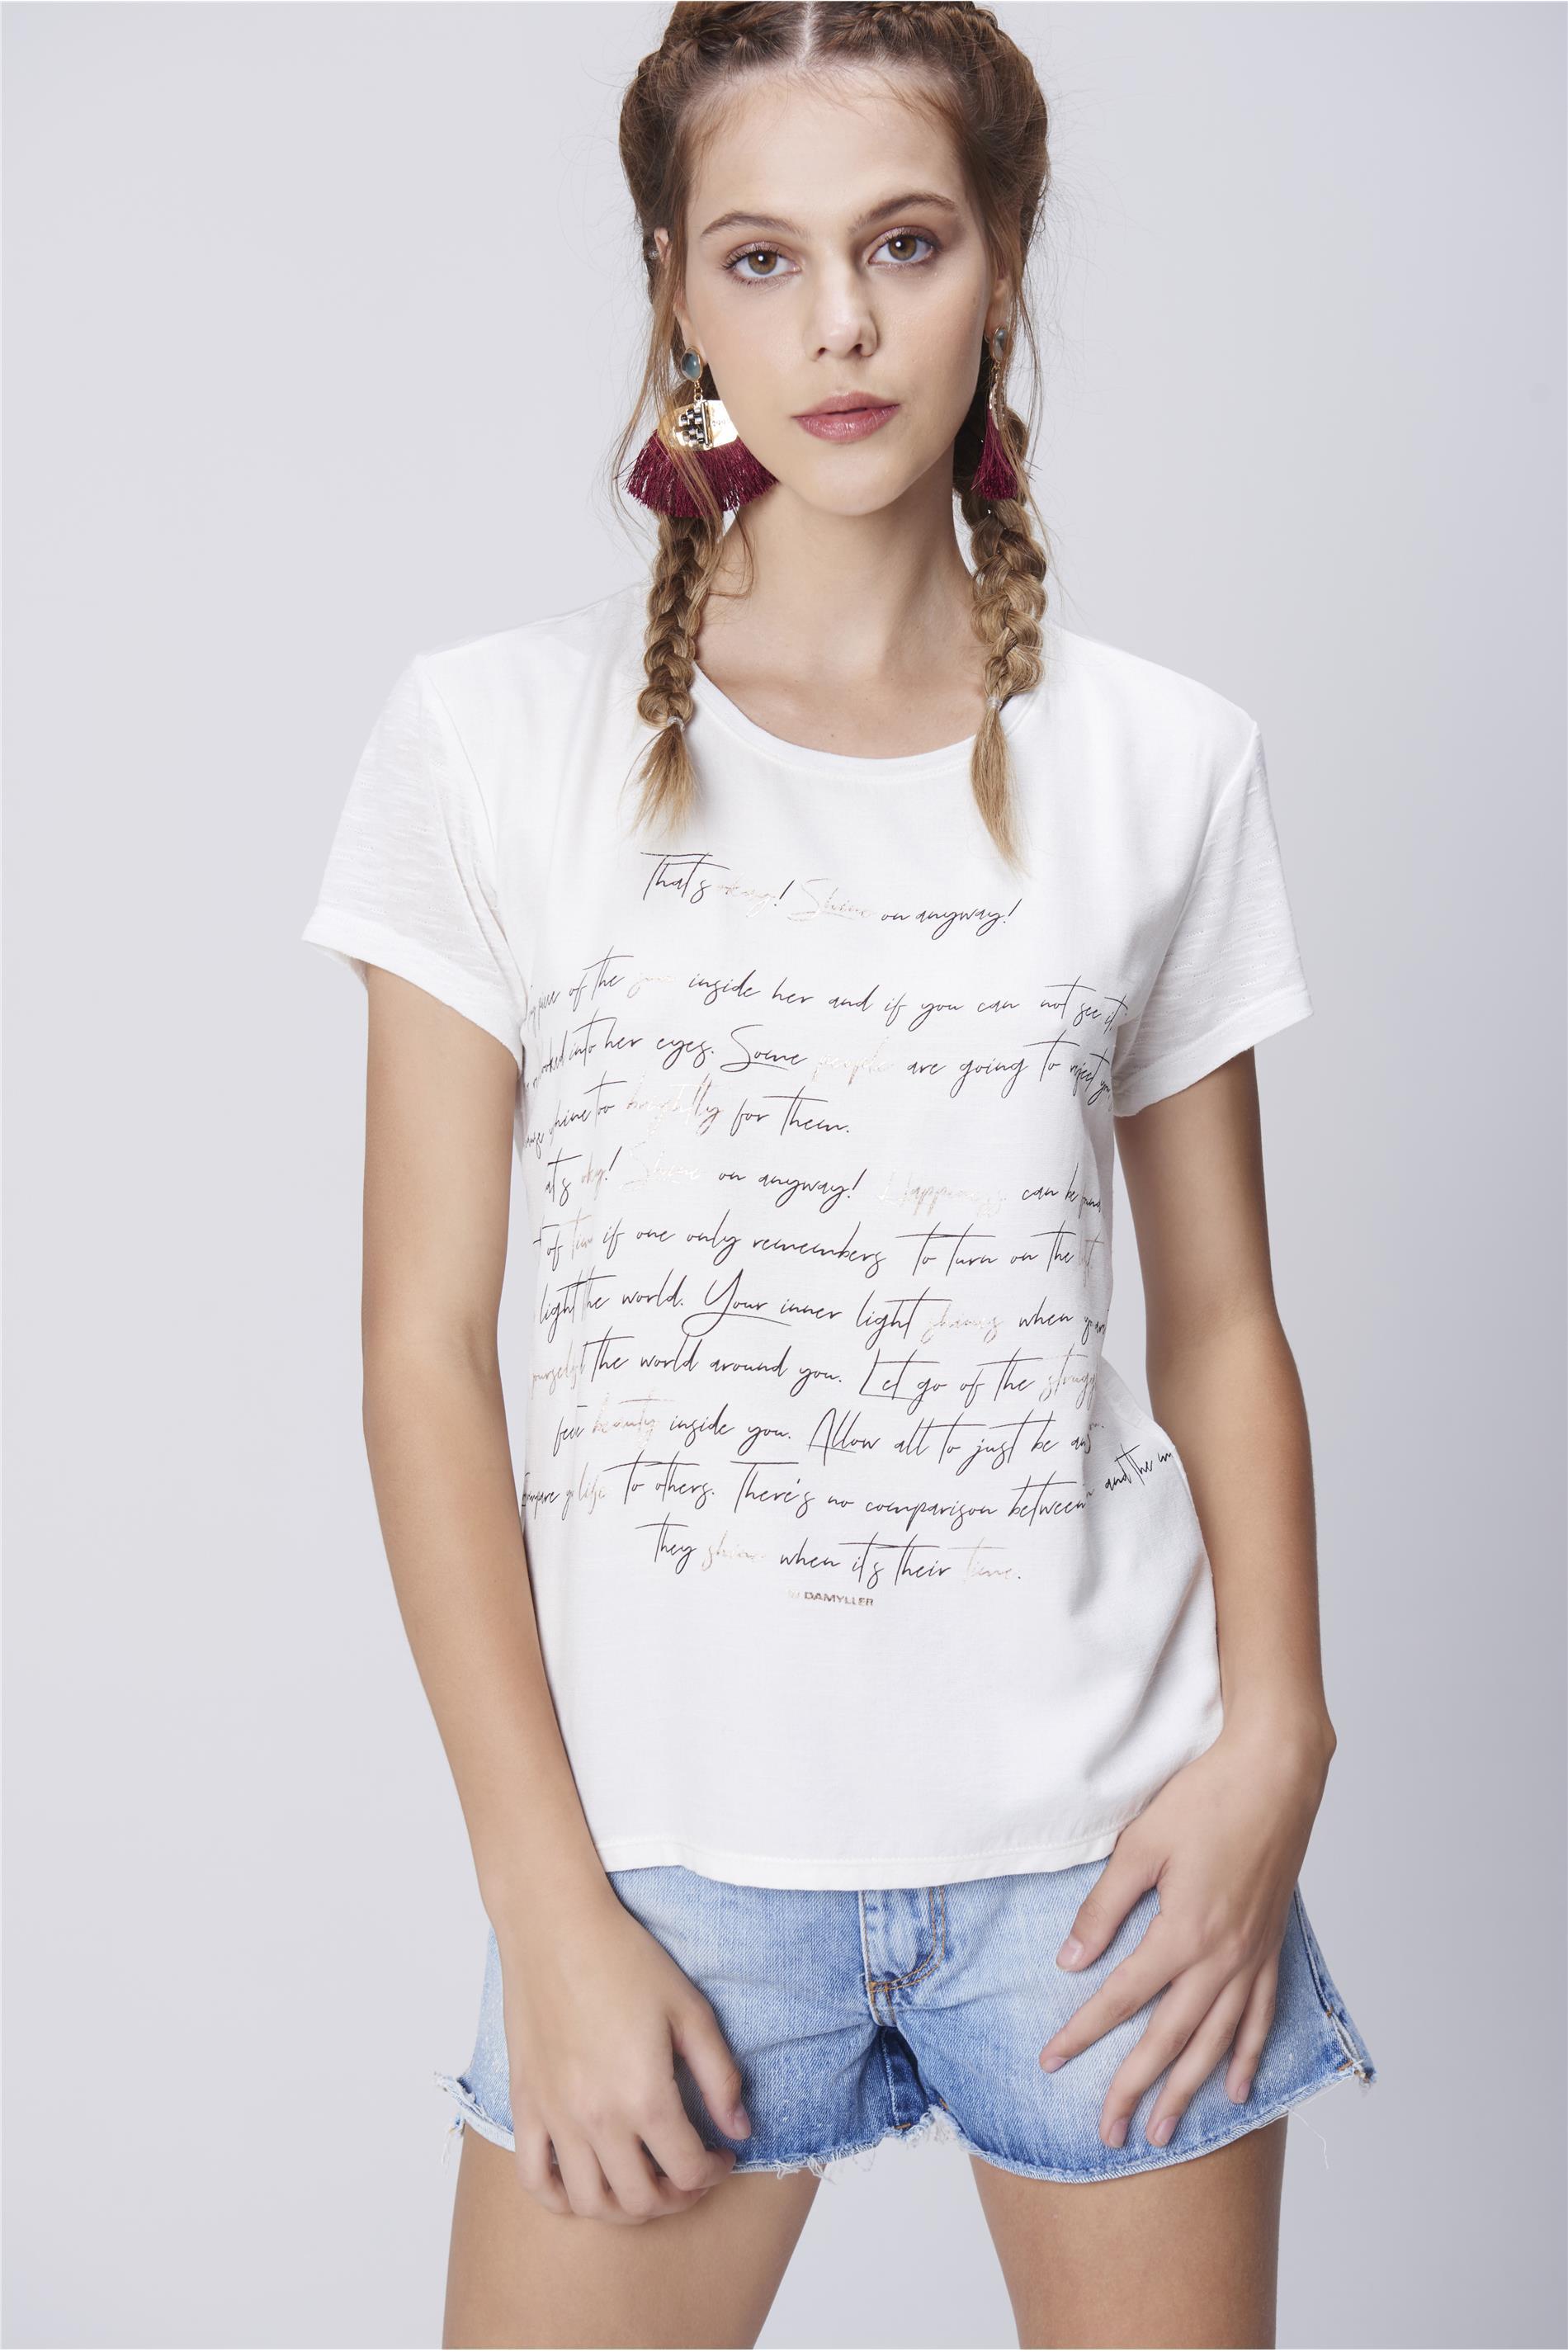 d6b2ad5b48 Camiseta Feminina Malha Flamê Estampada - Damyller